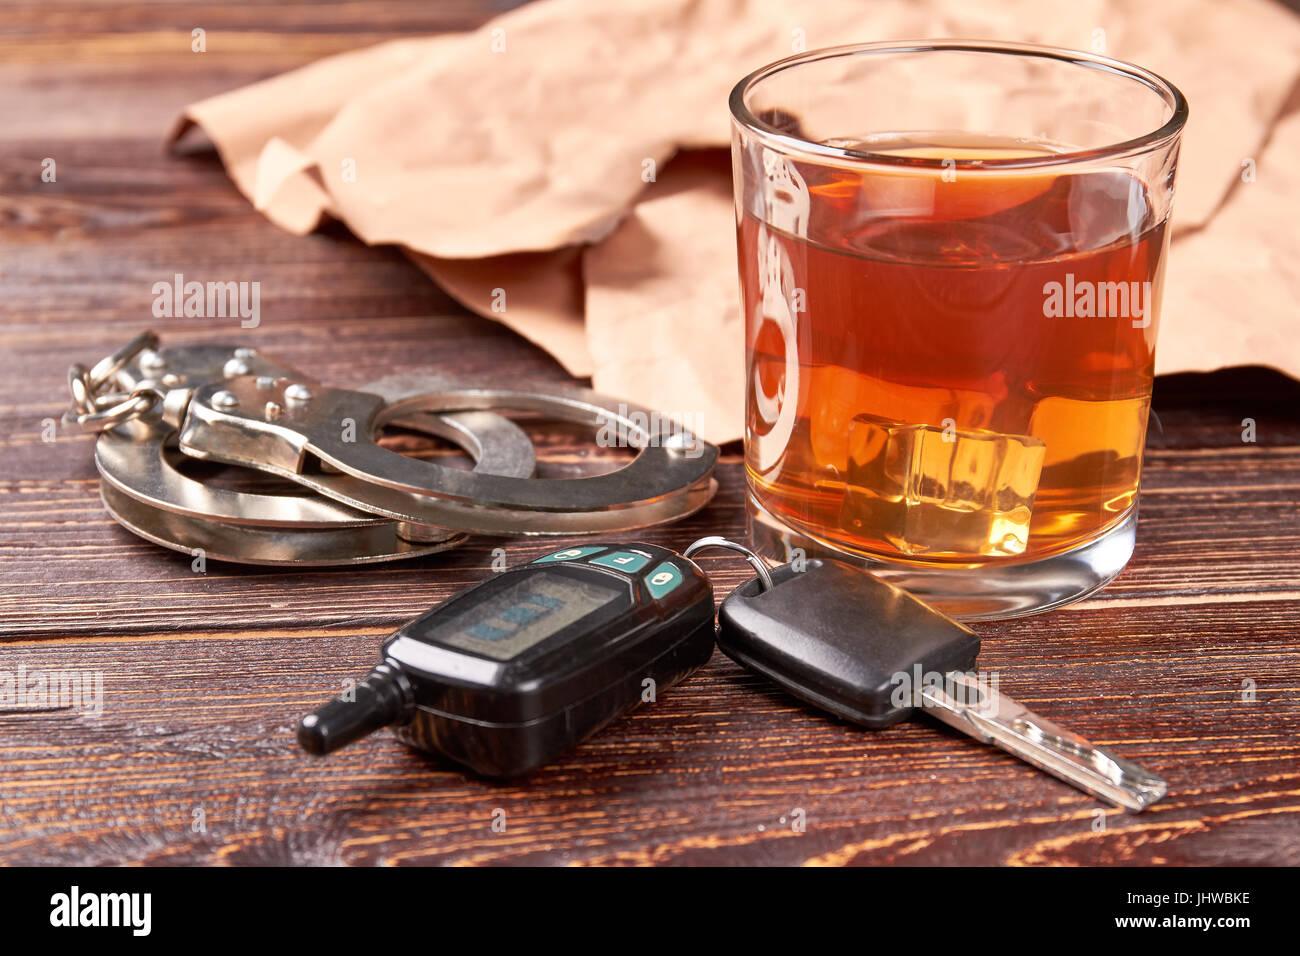 Handcuffs, car keys, whisky glass. - Stock Image